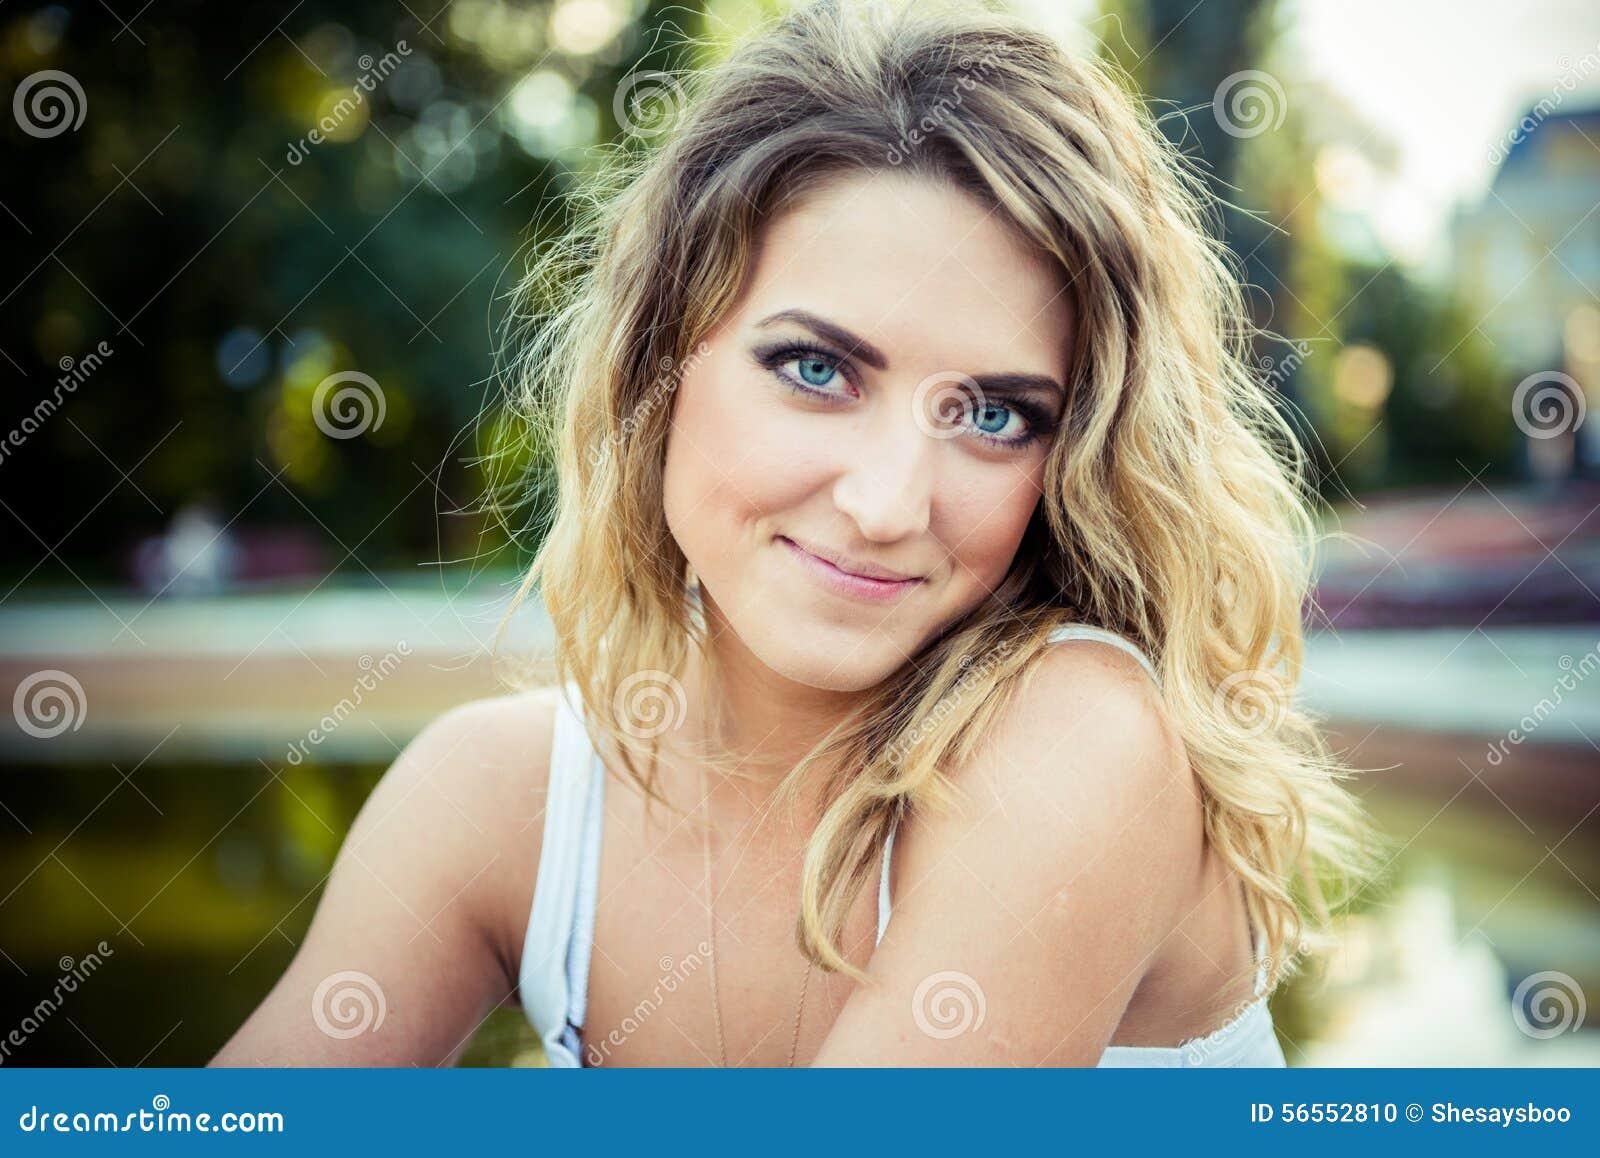 Download Τοποθέτηση κοριτσιών μόδας με το σακάκι δέρματος Στοκ Εικόνες - εικόνα από οδοντωτός, άνθρωποι: 56552810